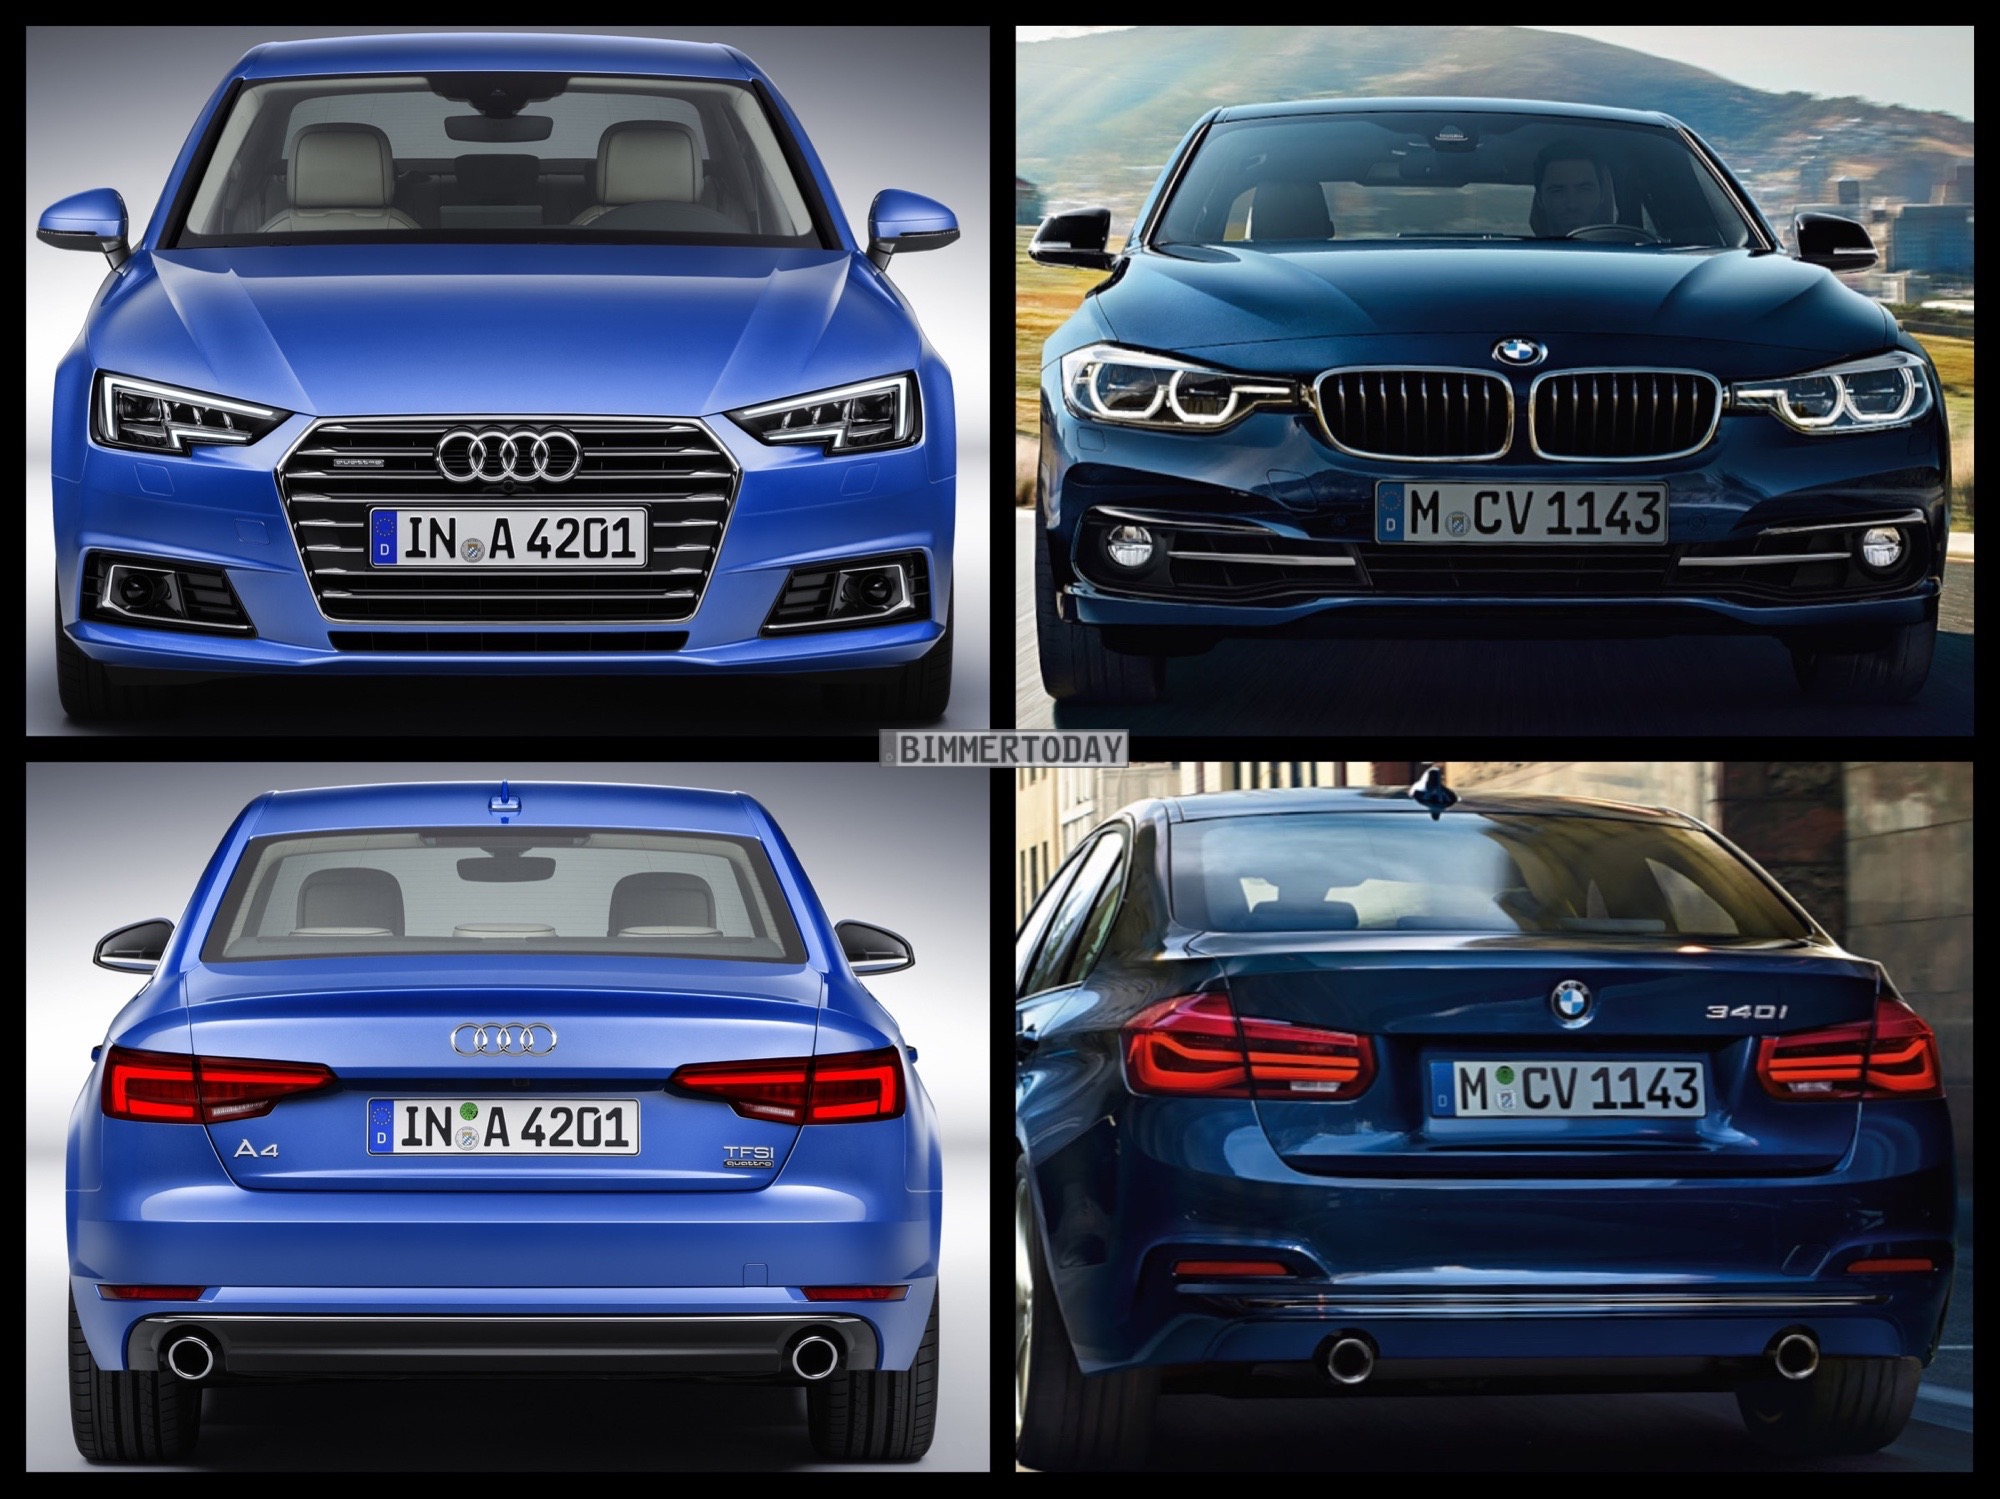 Photo Comparison 2016 Bmw 3 Series Vs 2017 Audi A4